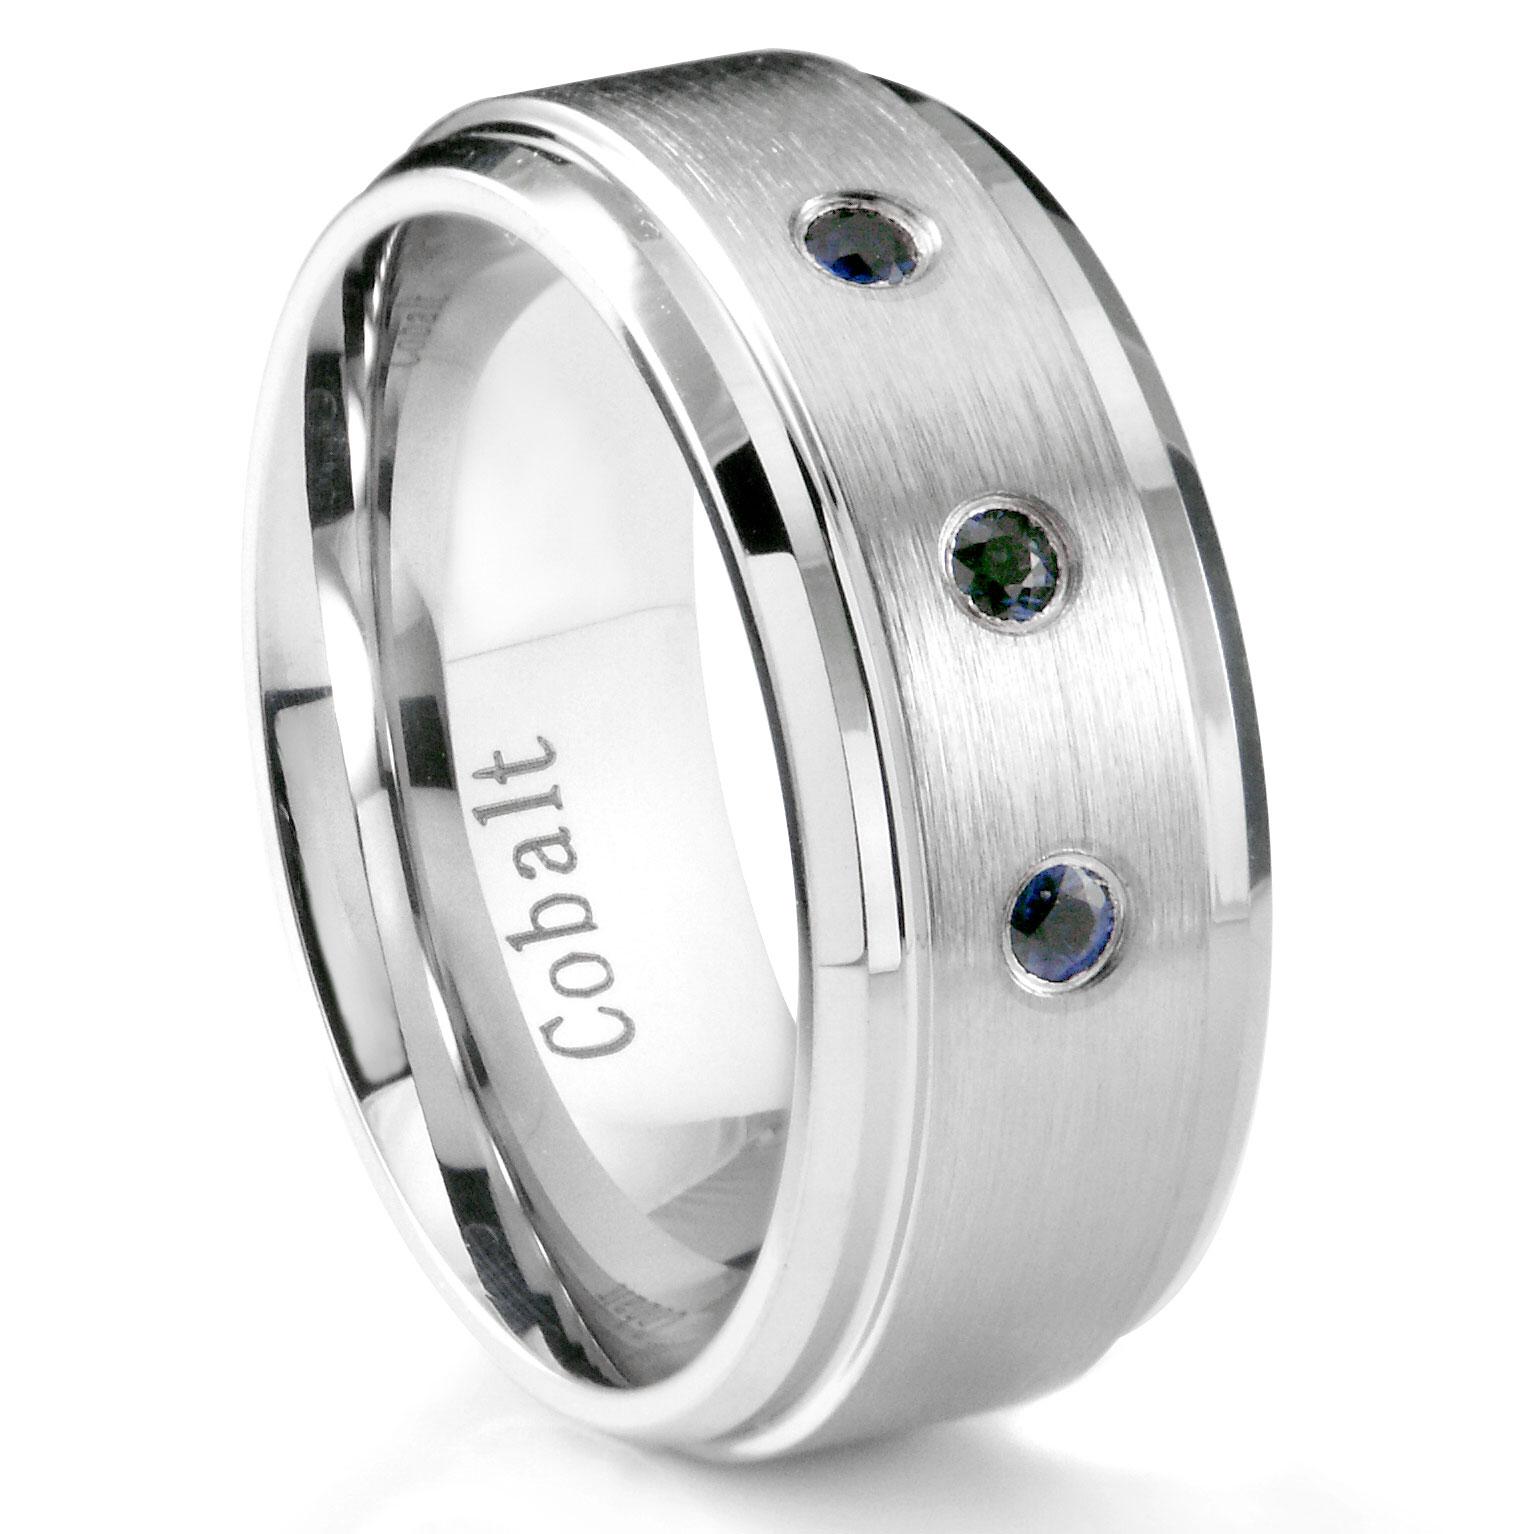 Cobalt Chrome 8MM 3 Blue Sapphire Wedding Band Ring w Stepped Edges P sapphire wedding bands Loading zoom